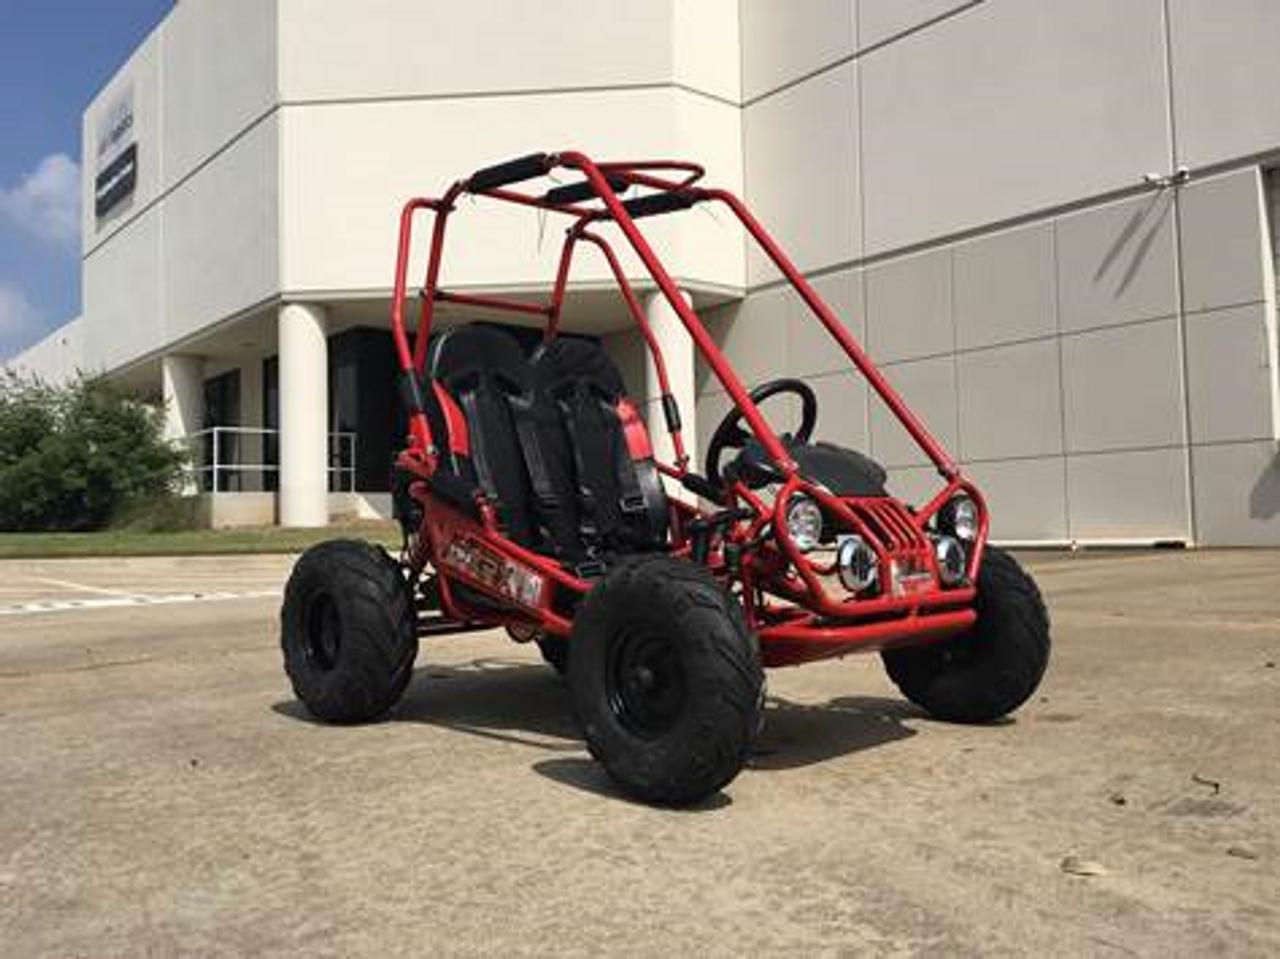 Trailmaster Mini Xrx-R Plus +